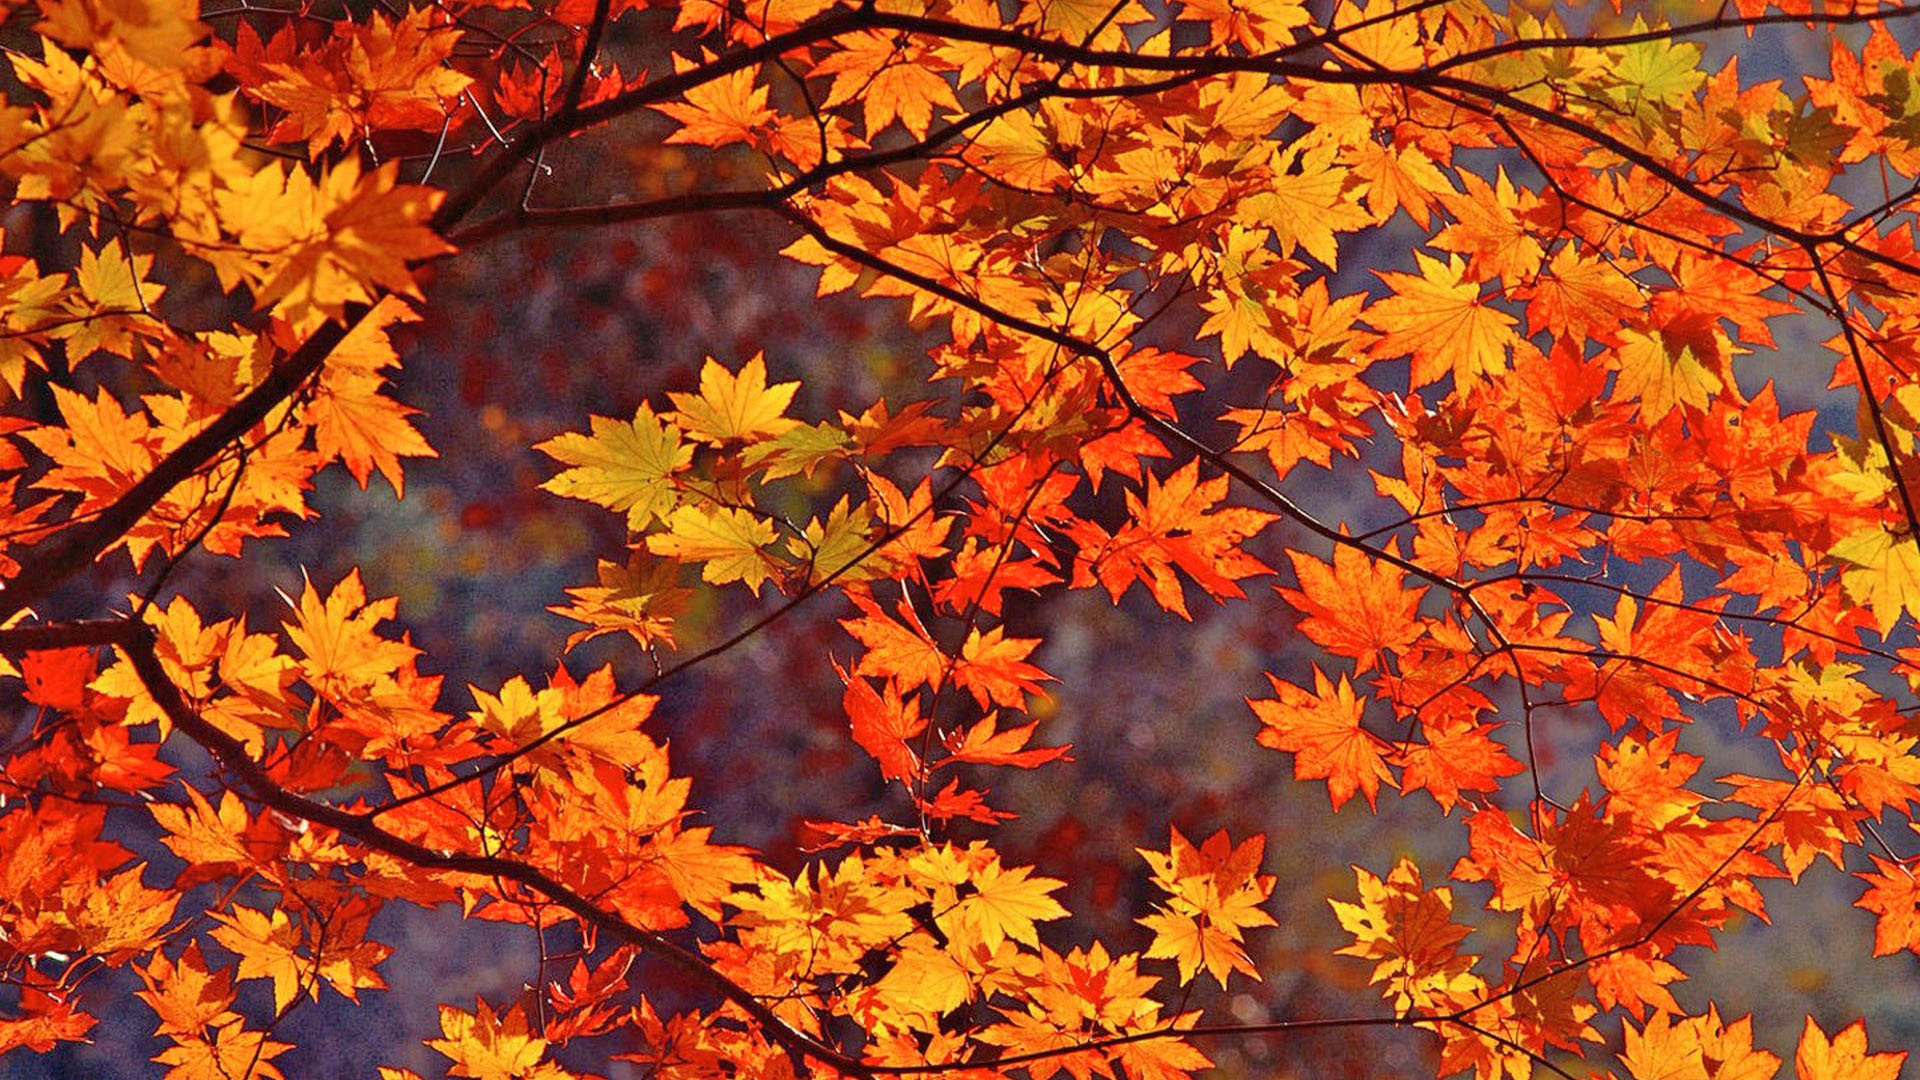 Fall-Leaves-Wallpaper-On-Wallpaper-Hd-8.jpg